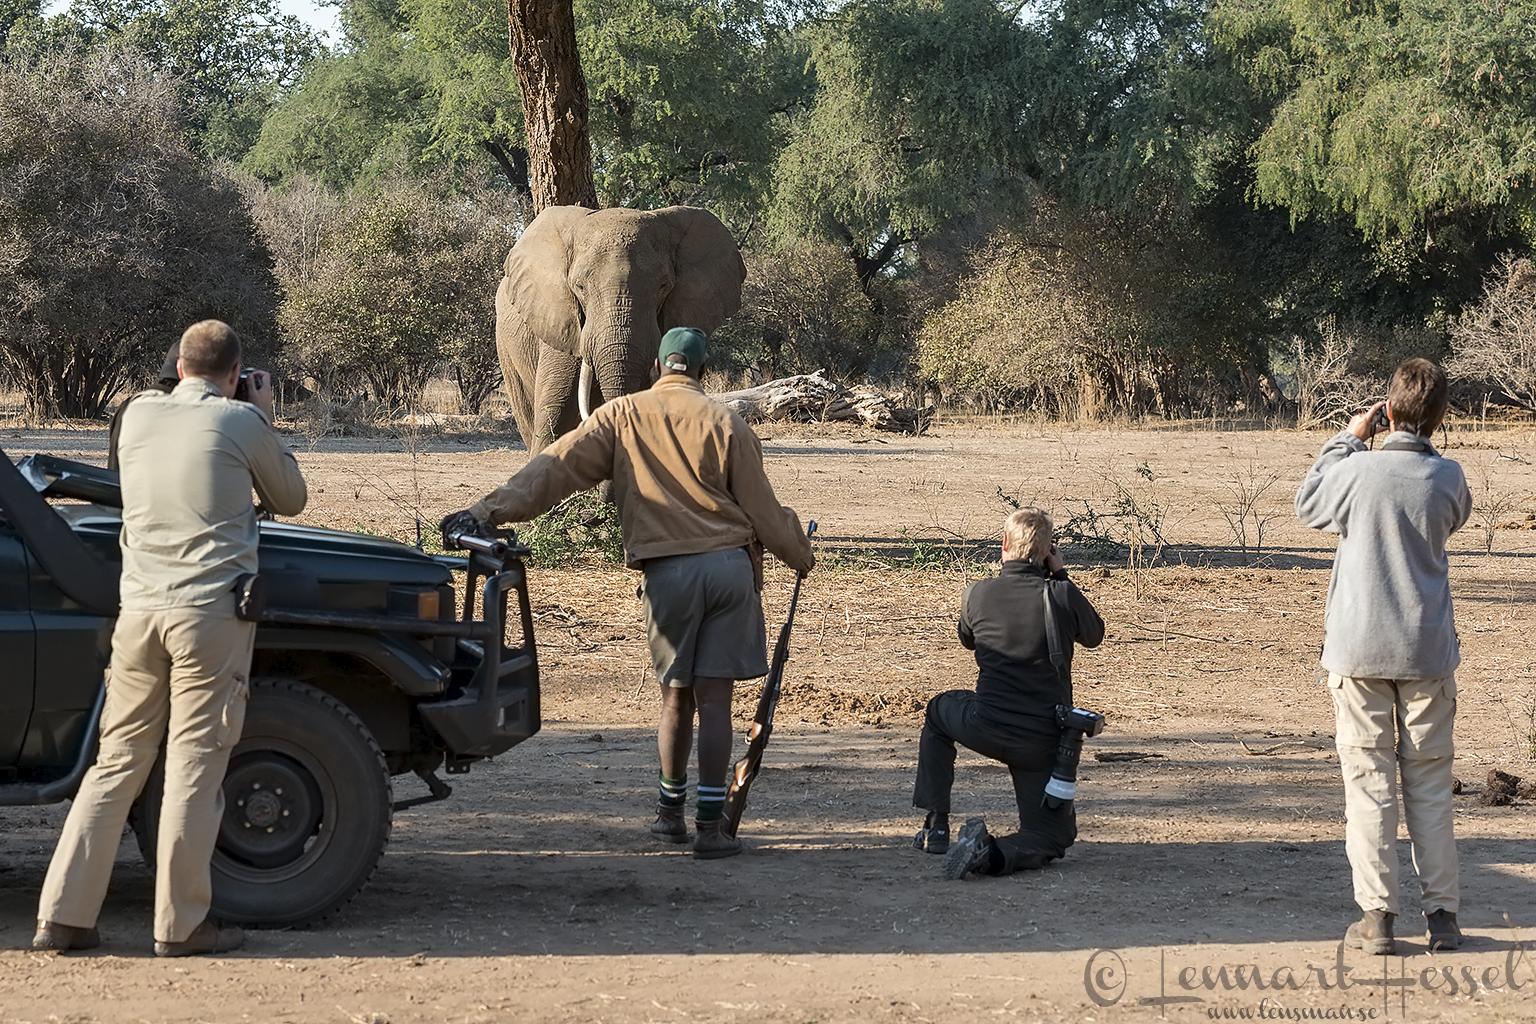 giants Mana Pools National Park, Zimbabwe